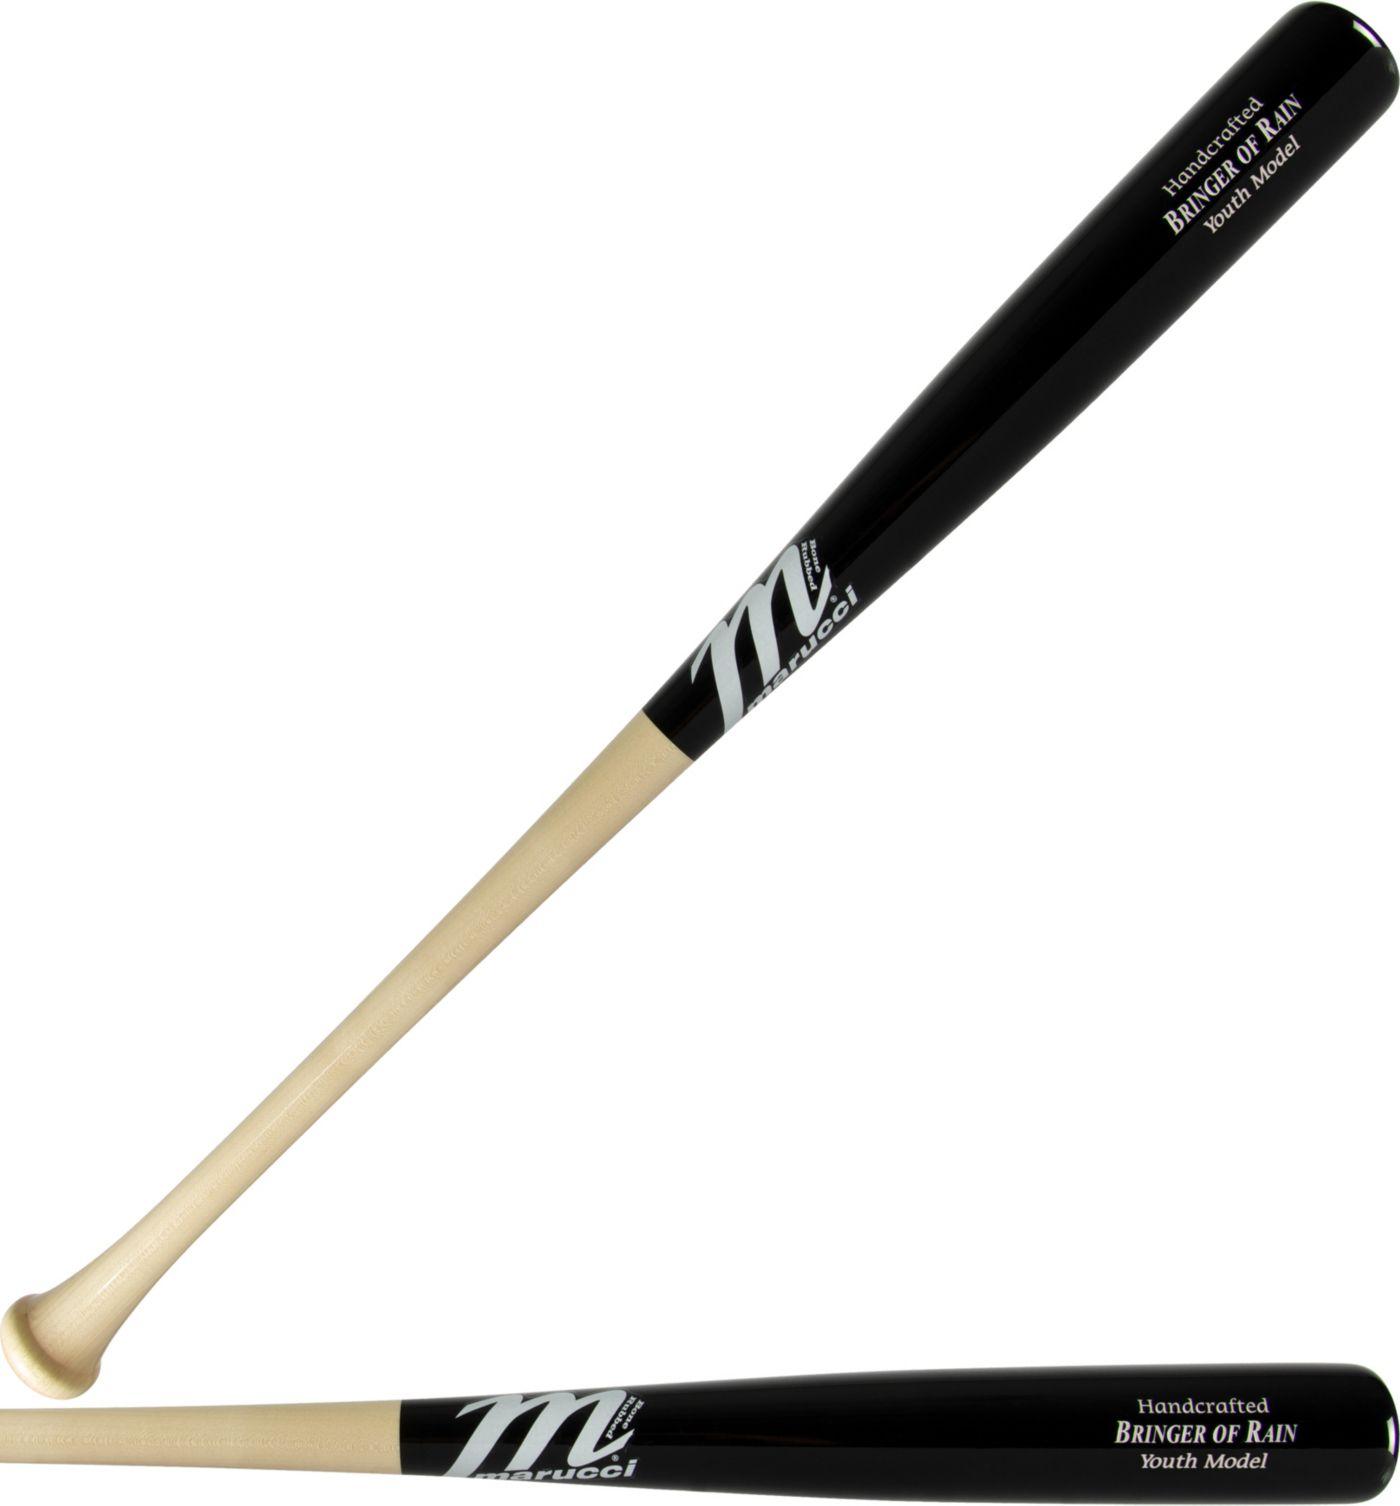 Marucci Bringer of Rain Pro Maple Youth Bat